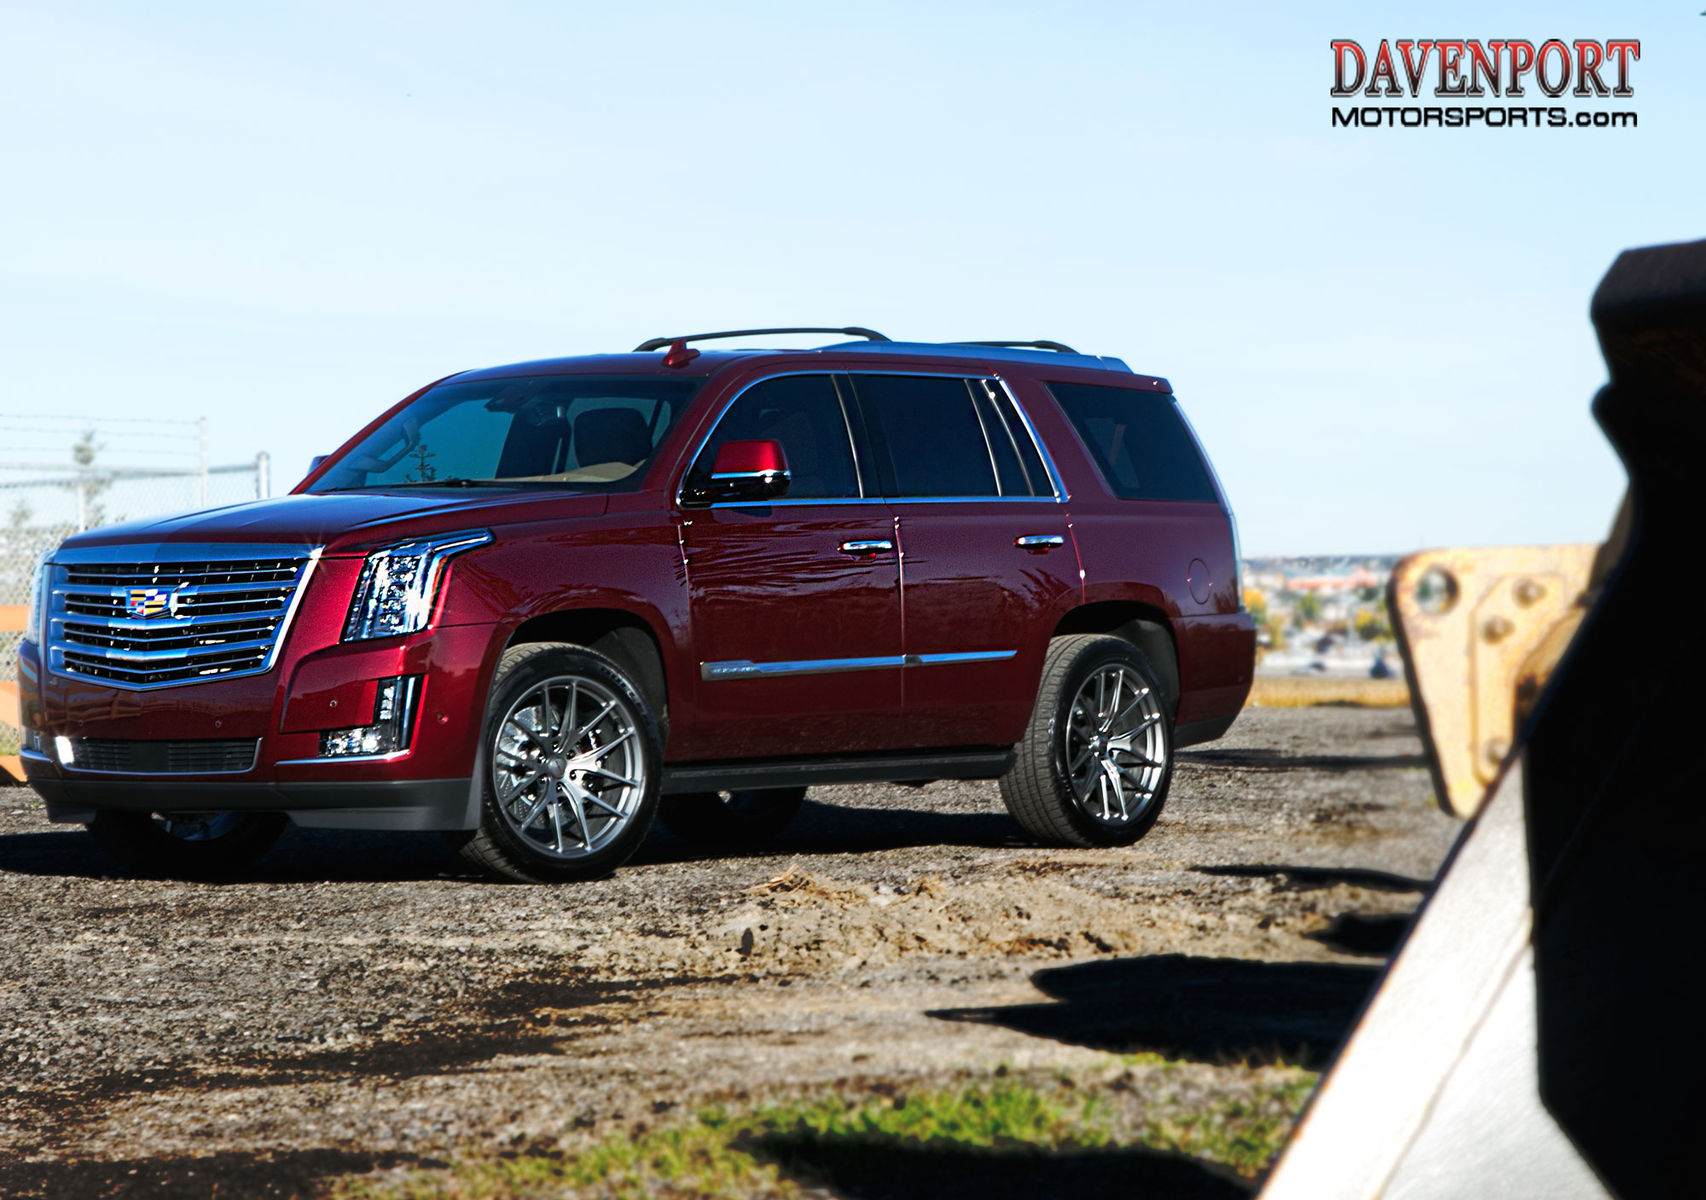 2017 Cadillac Escalade   Gord B's Davenport-Tuned Cadillac Escalade on Forgeline One Piece Forged Monoblock VX1-Truck Wheels